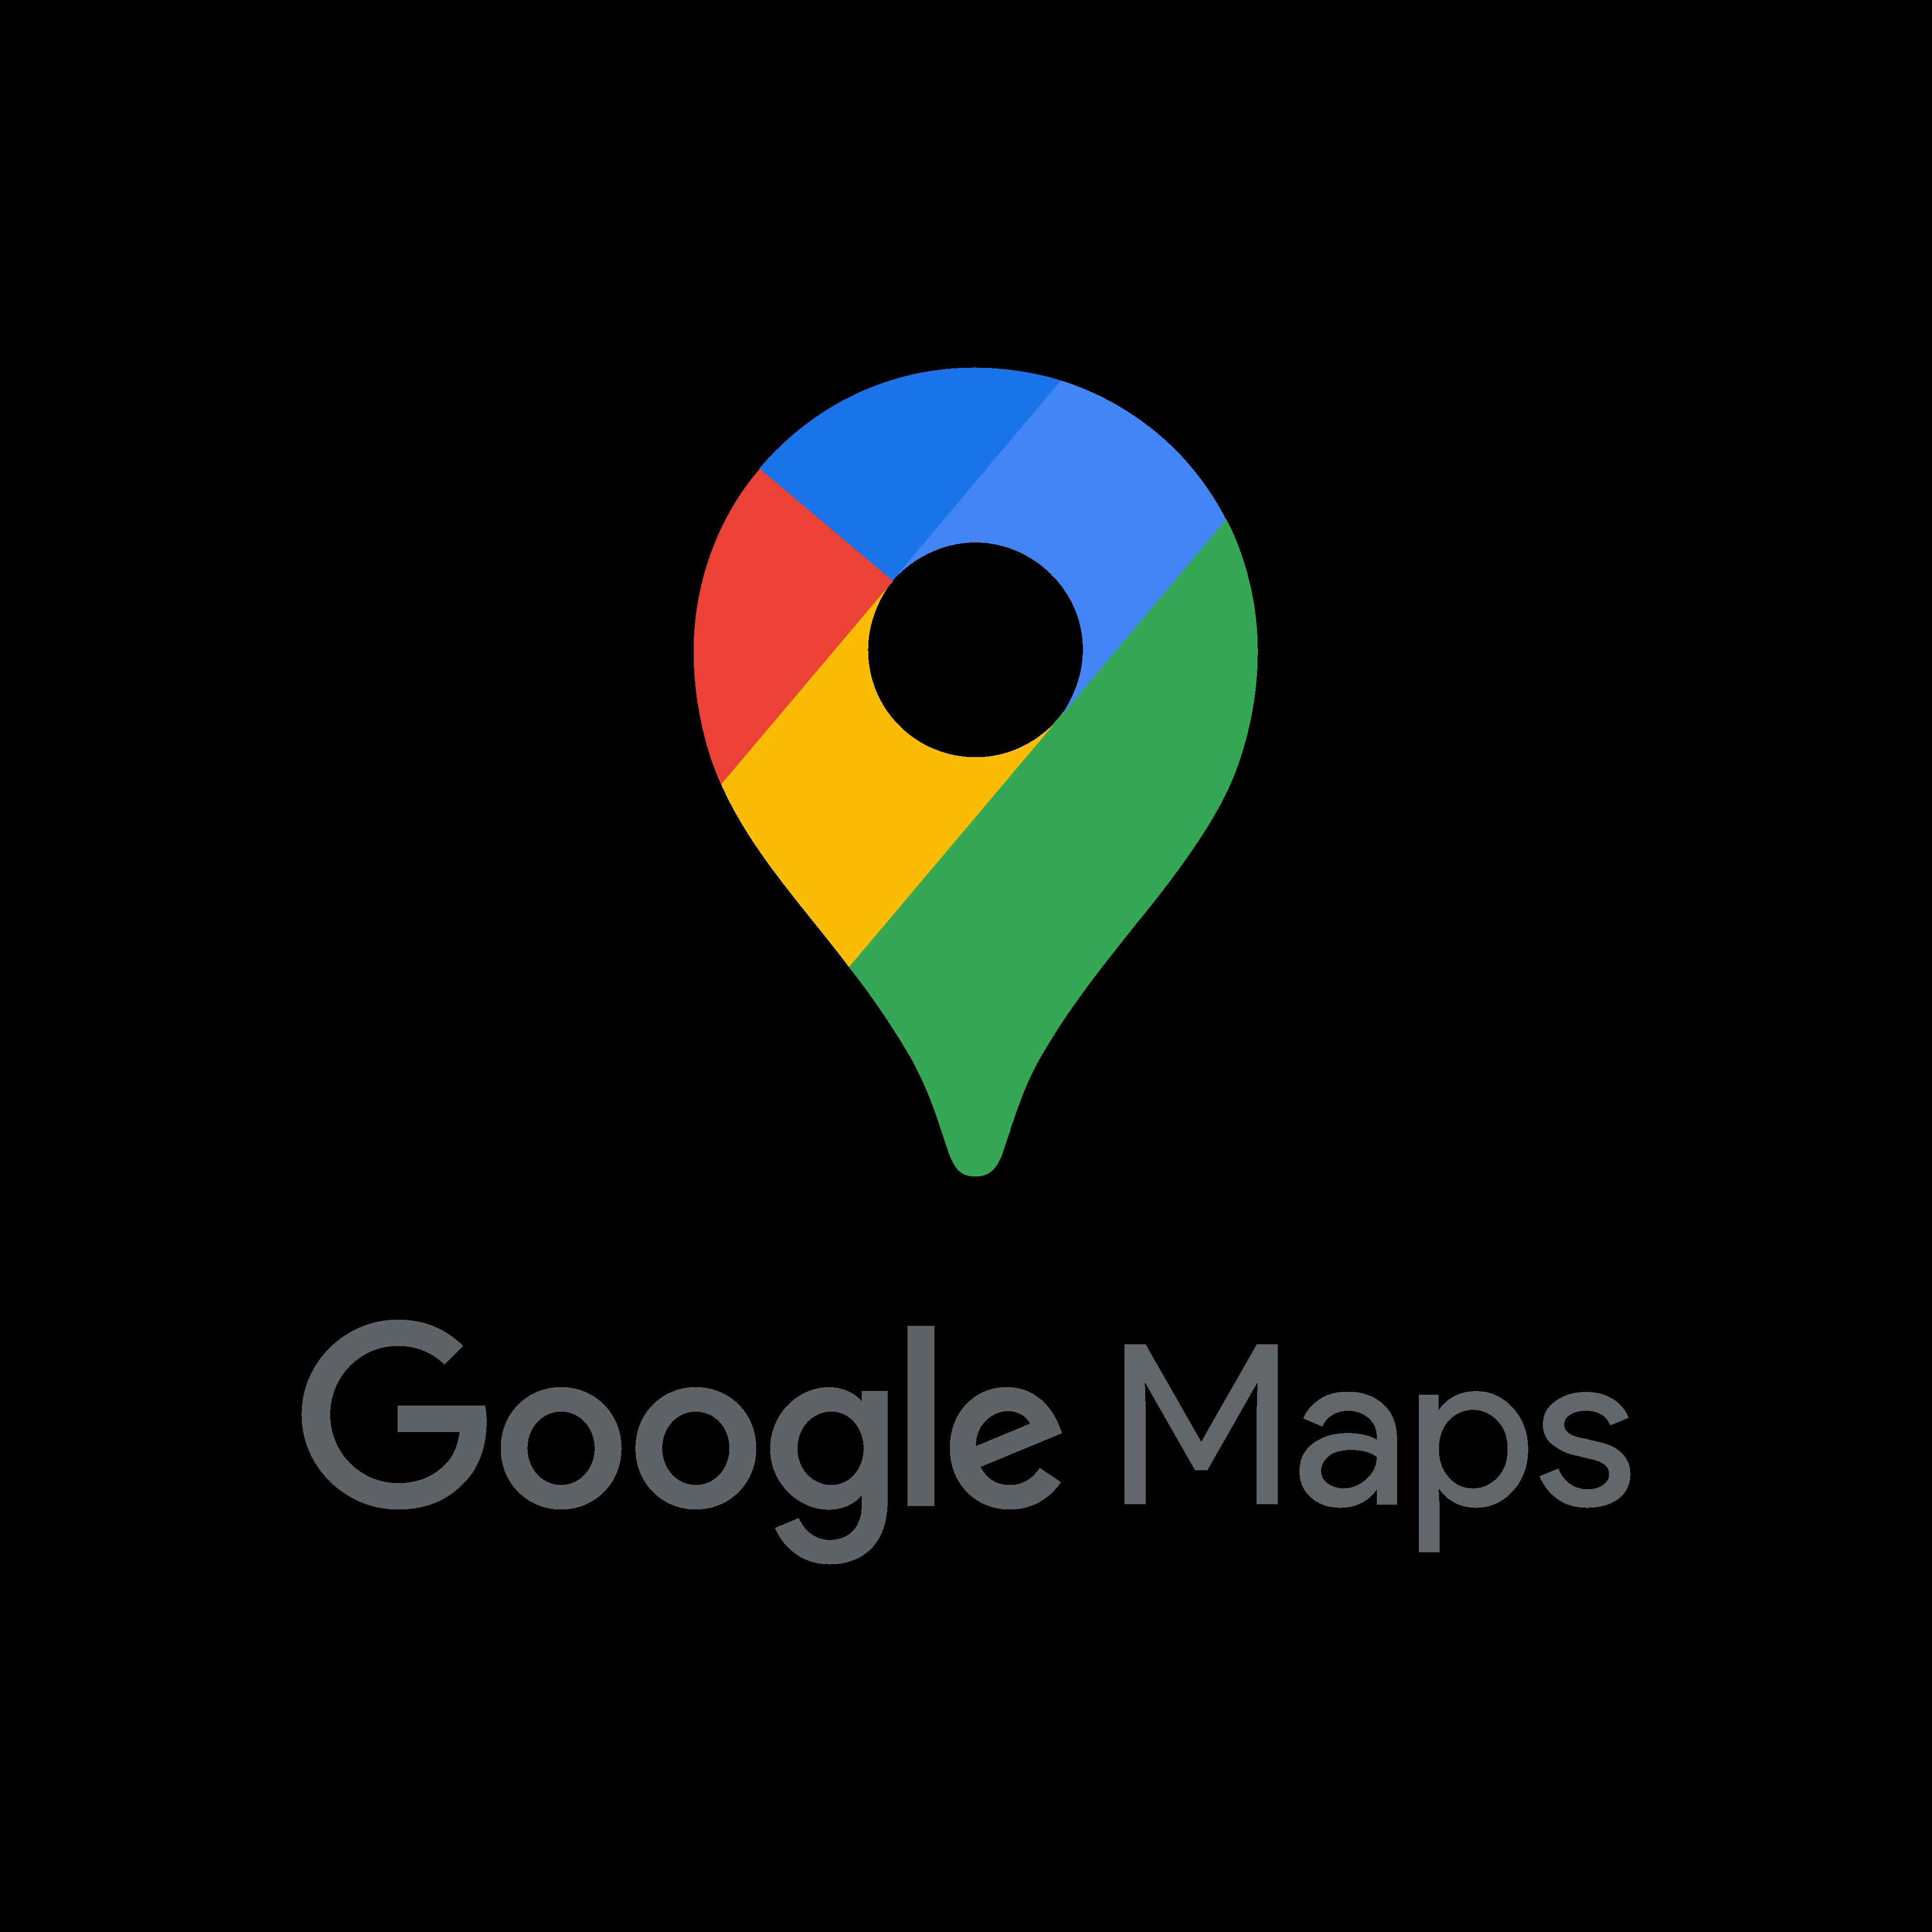 google maps logo 0 - Google Maps Logo